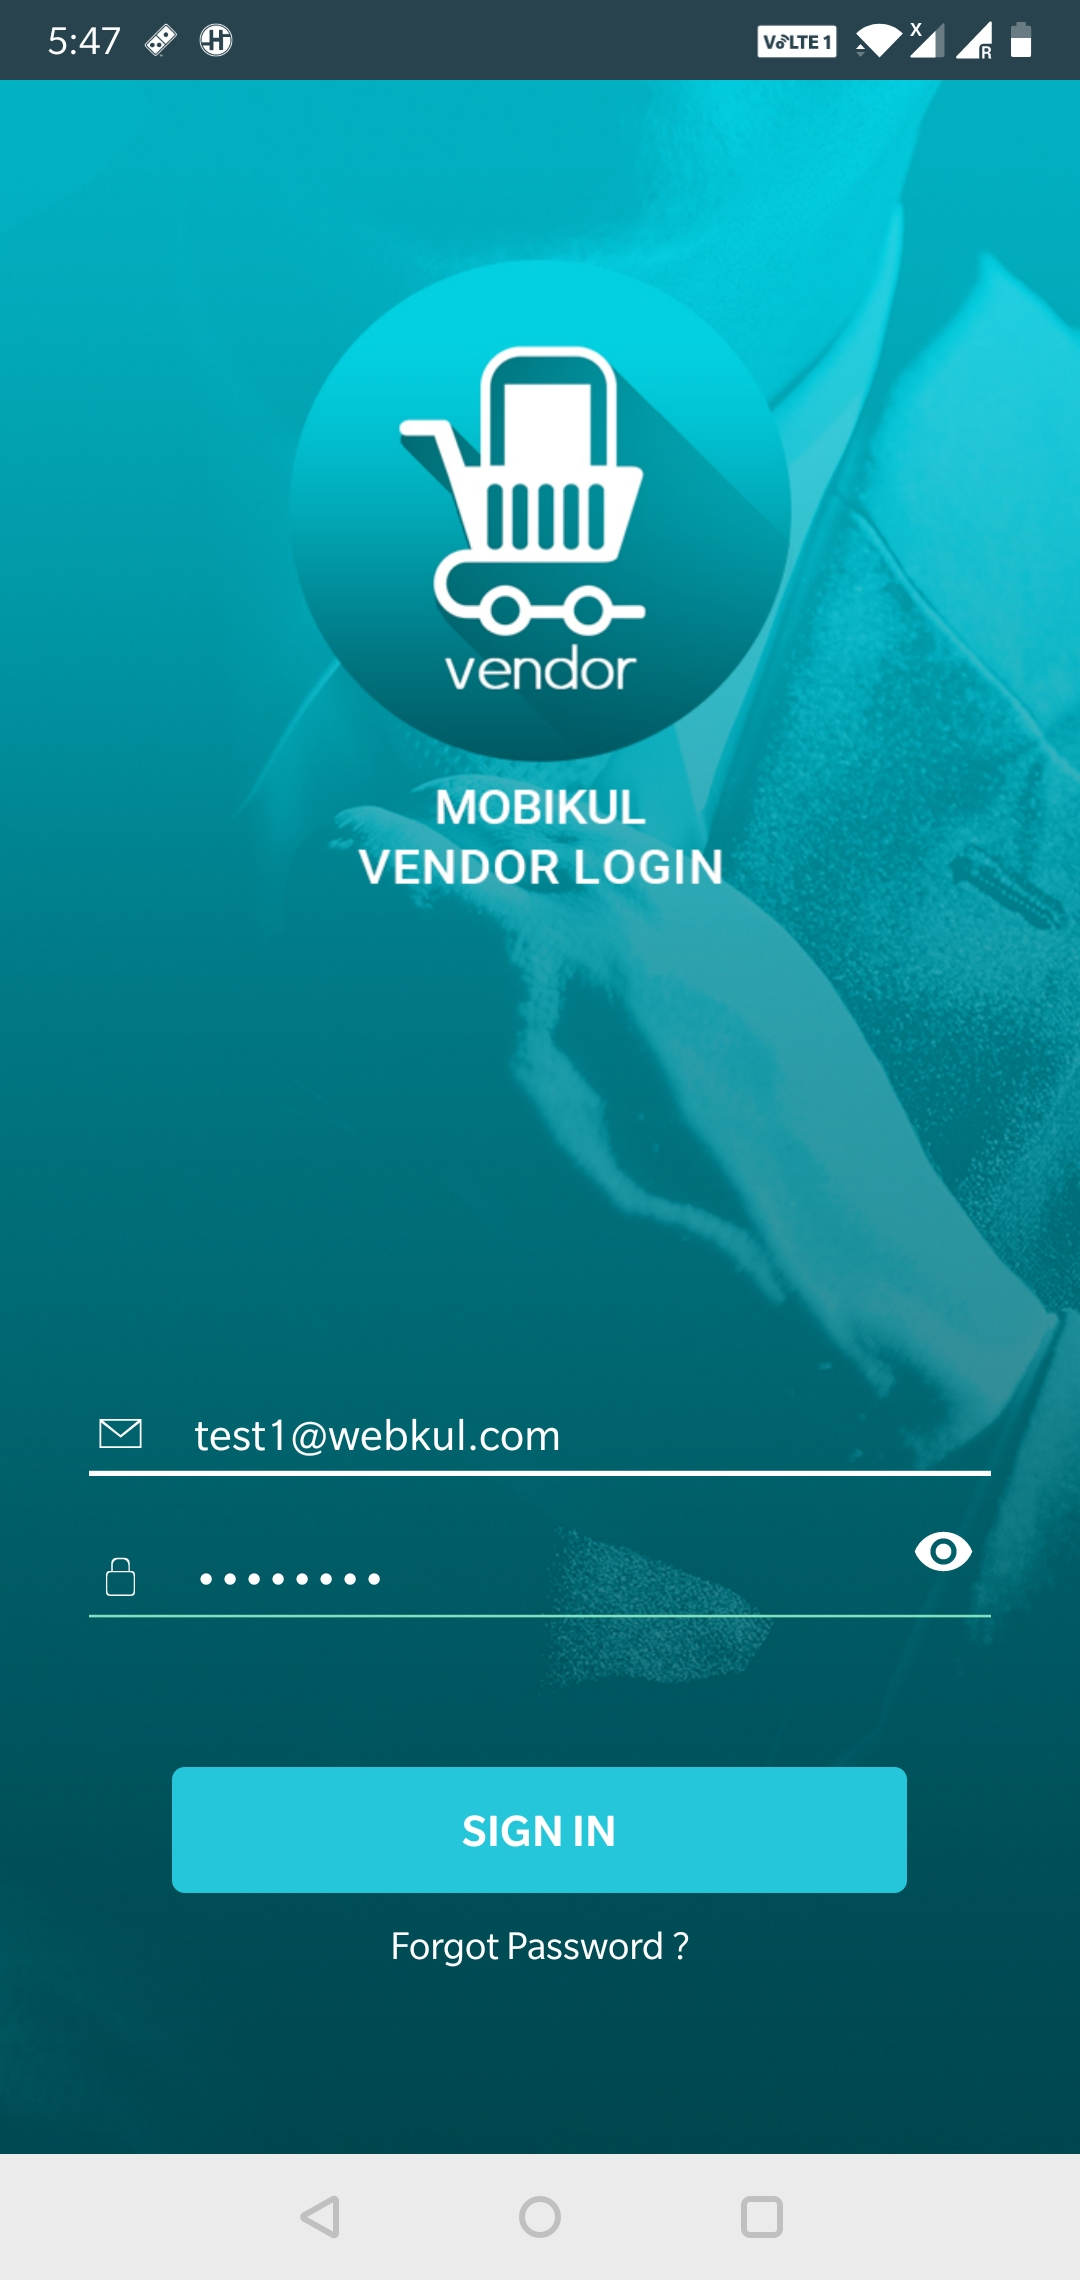 webkul-mobikul-cs-cart-vendor-app-seller-login-2